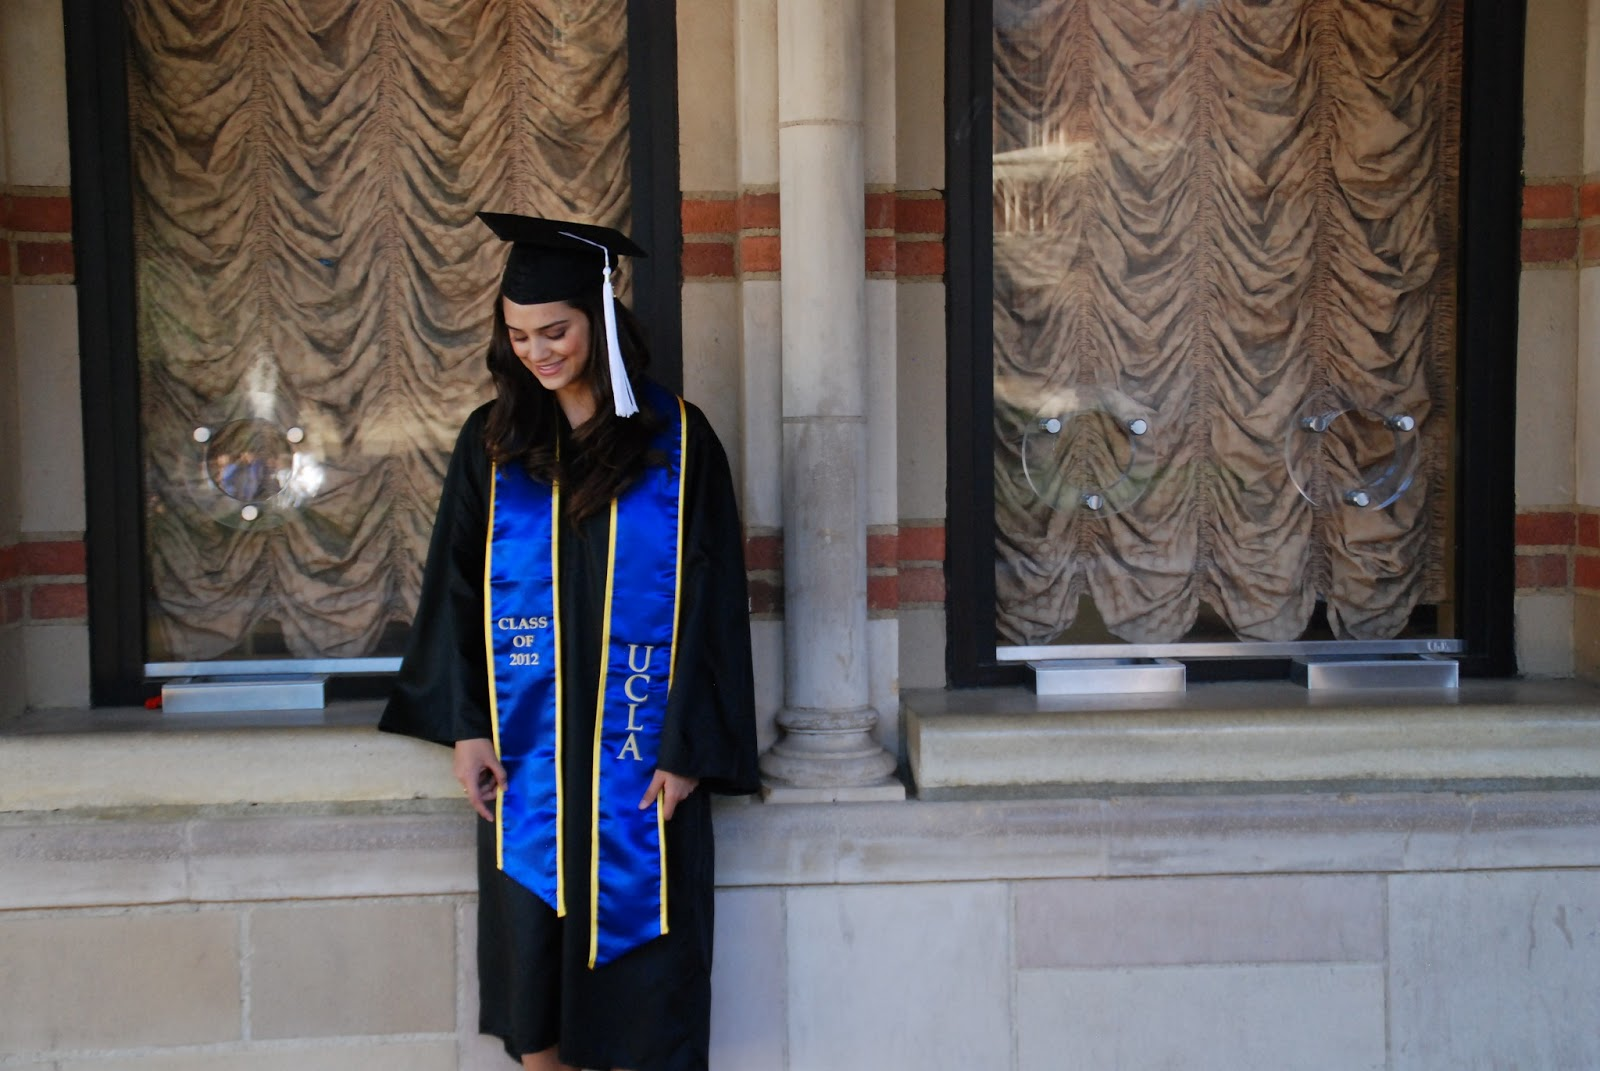 Throwback Thursday My Graduation Ucla Class Of 2012 Laurels Finds